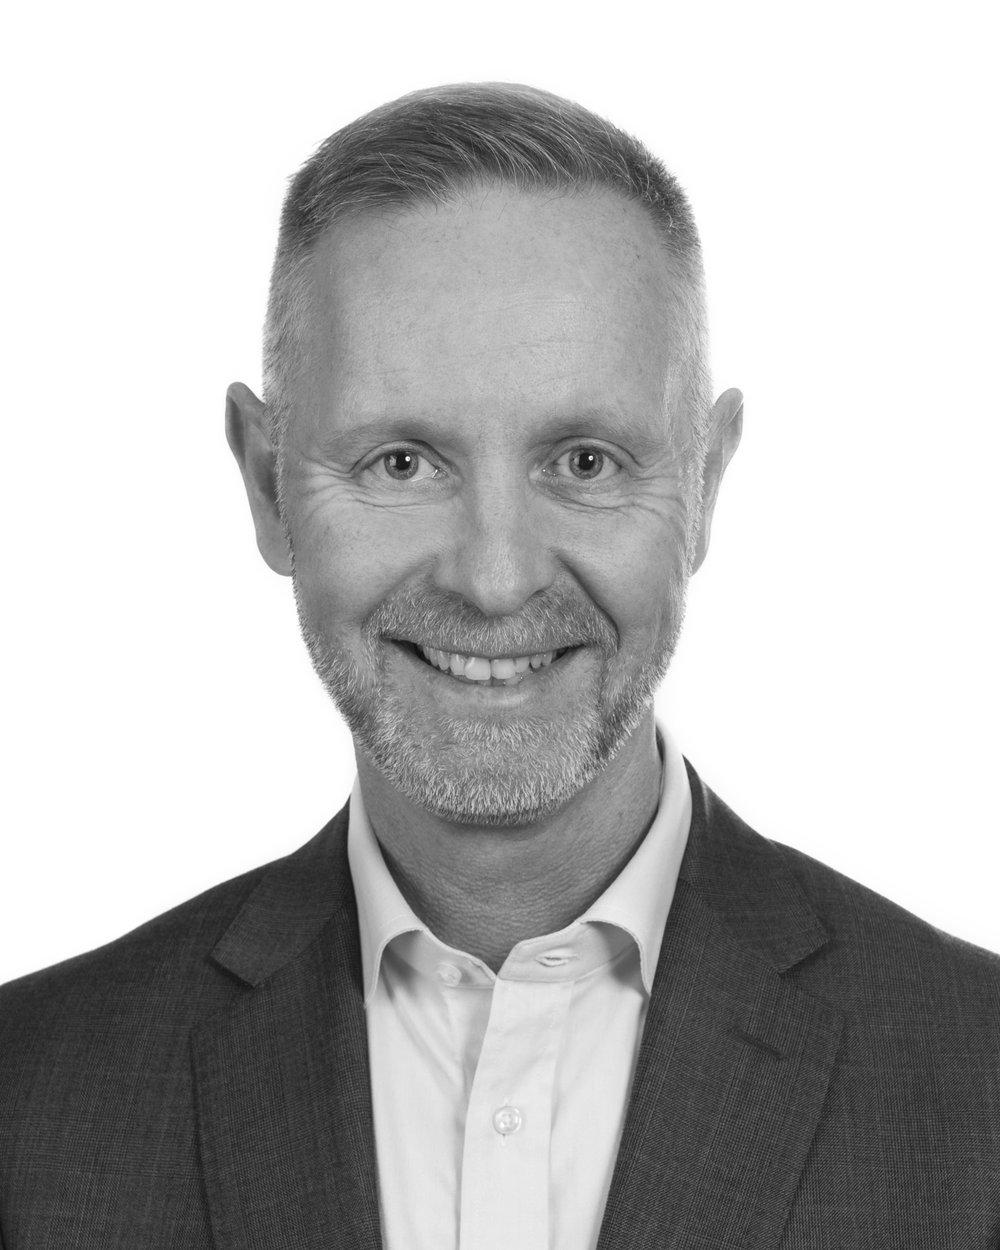 4. Halldór Jörgensson